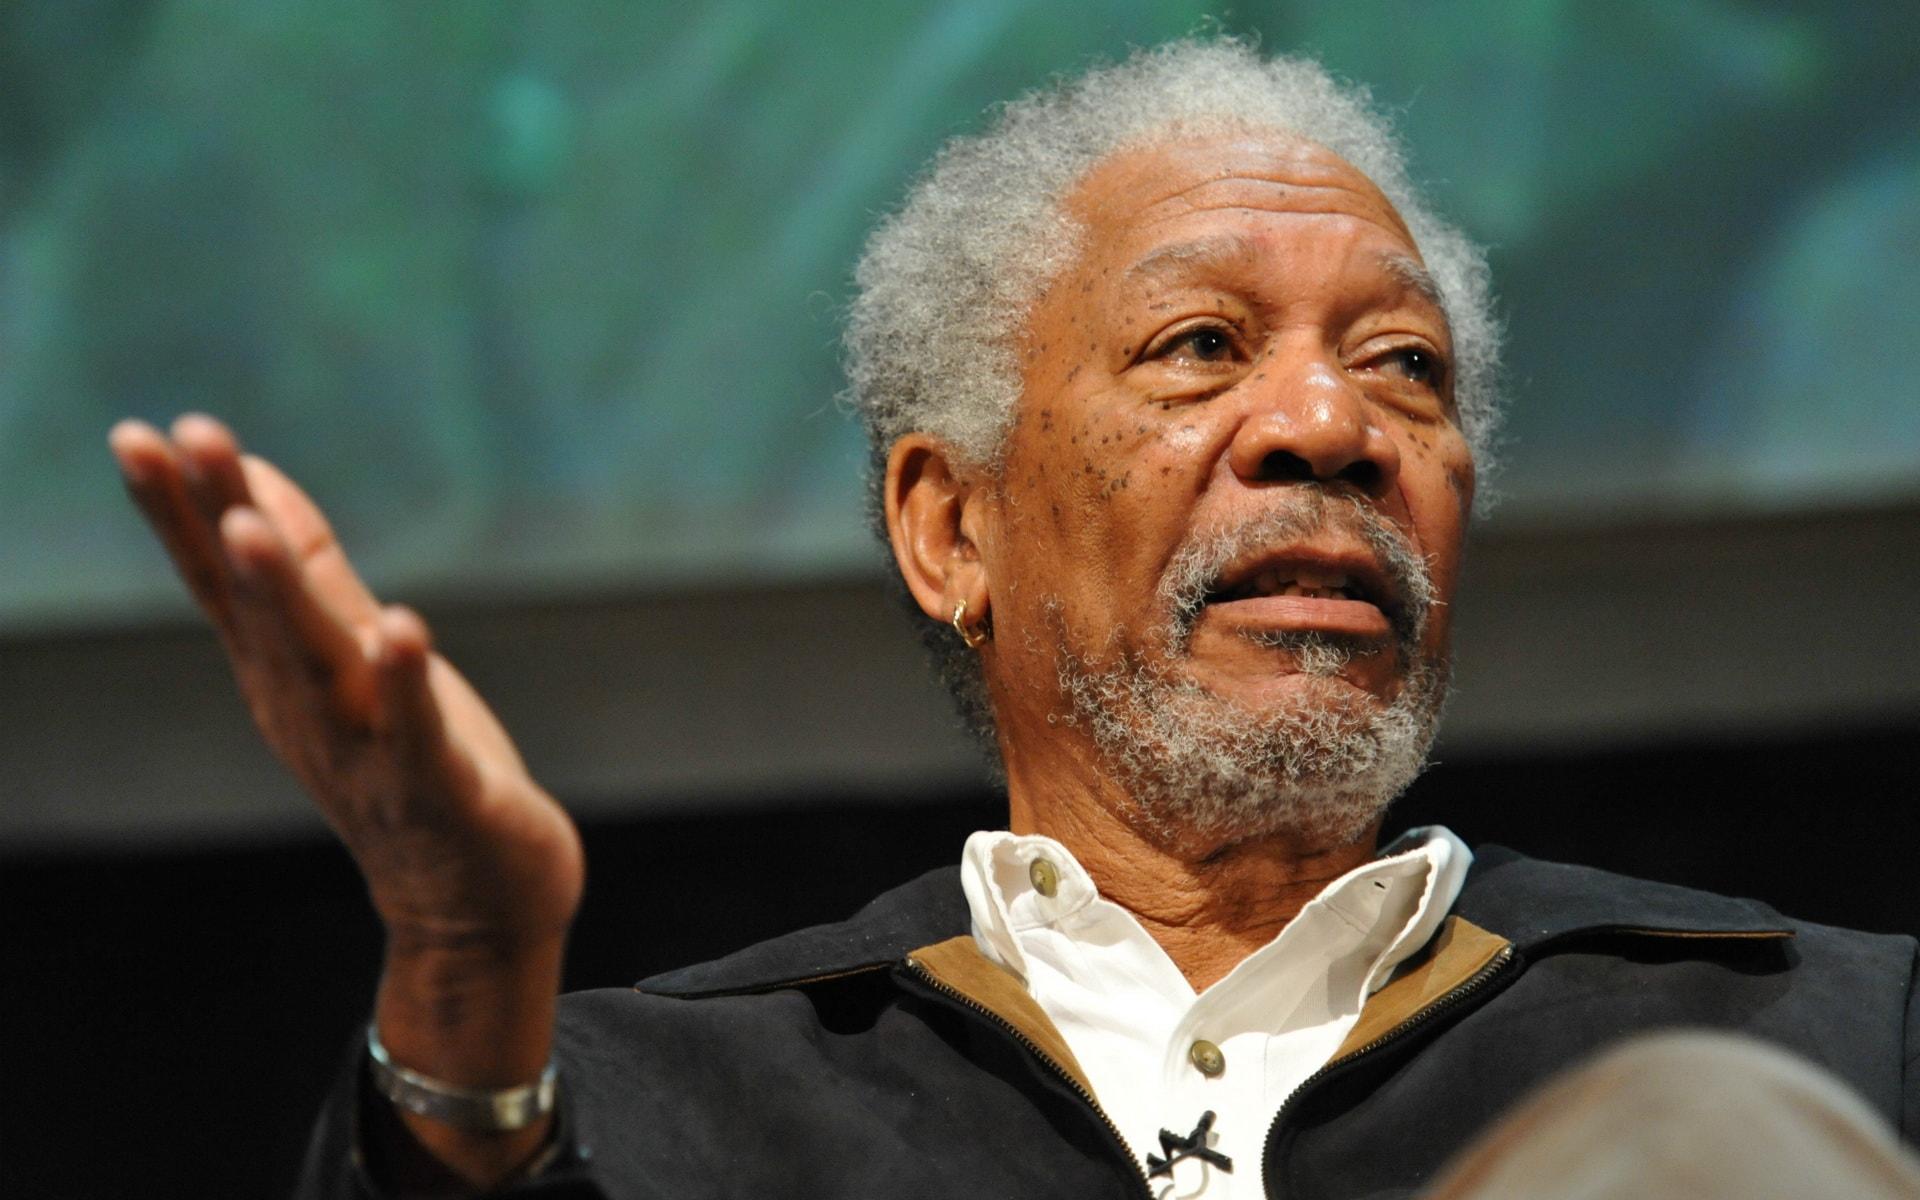 Morgan Freeman Full hd wallpapers